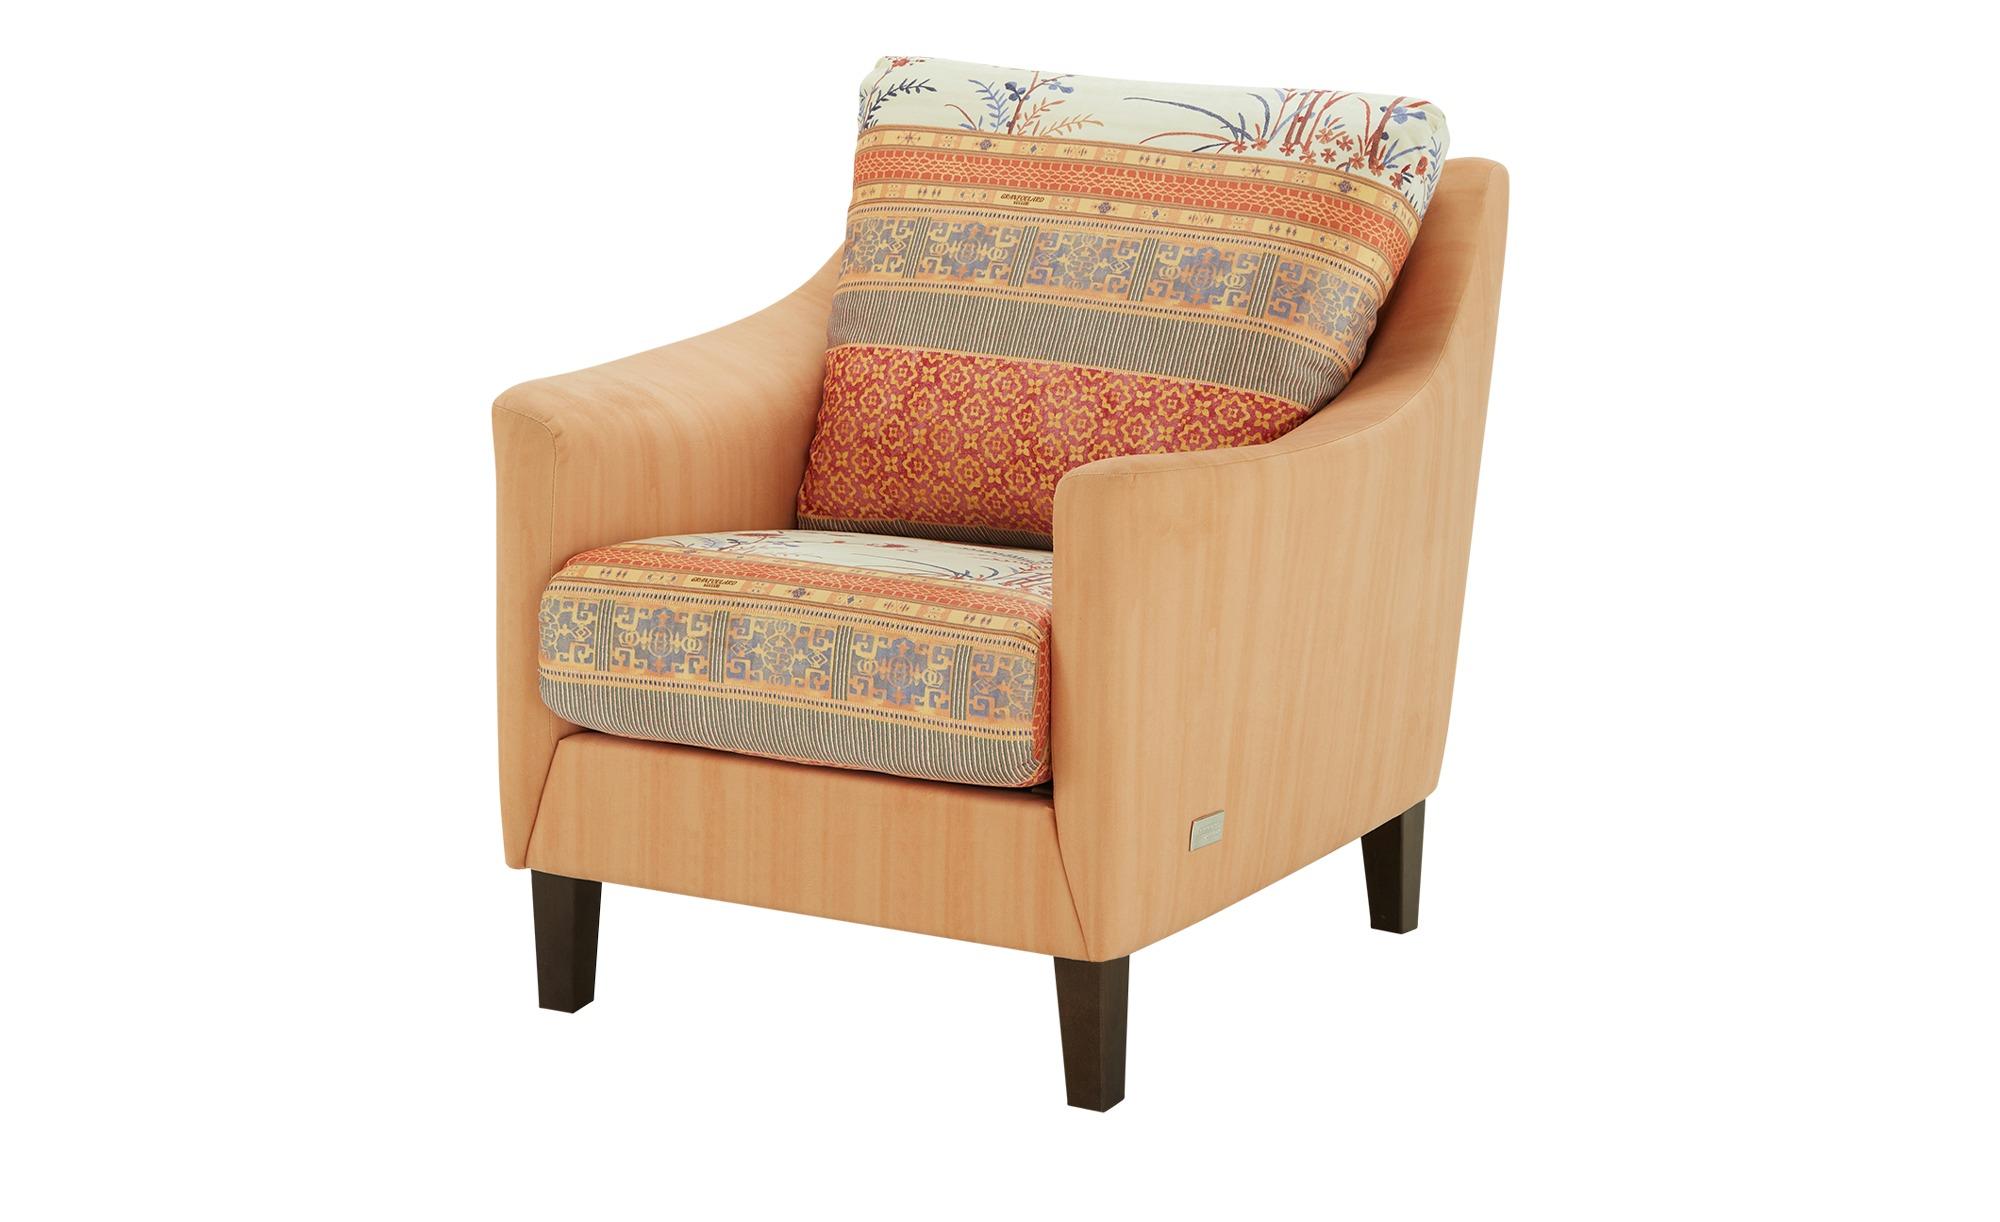 bassetti by SCHRÖNO Sessel  Ancona ¦ orange ¦ Maße (cm): B: 84 H: 90 T: 92 Polstermöbel > Sessel > Polstersessel - Höffner